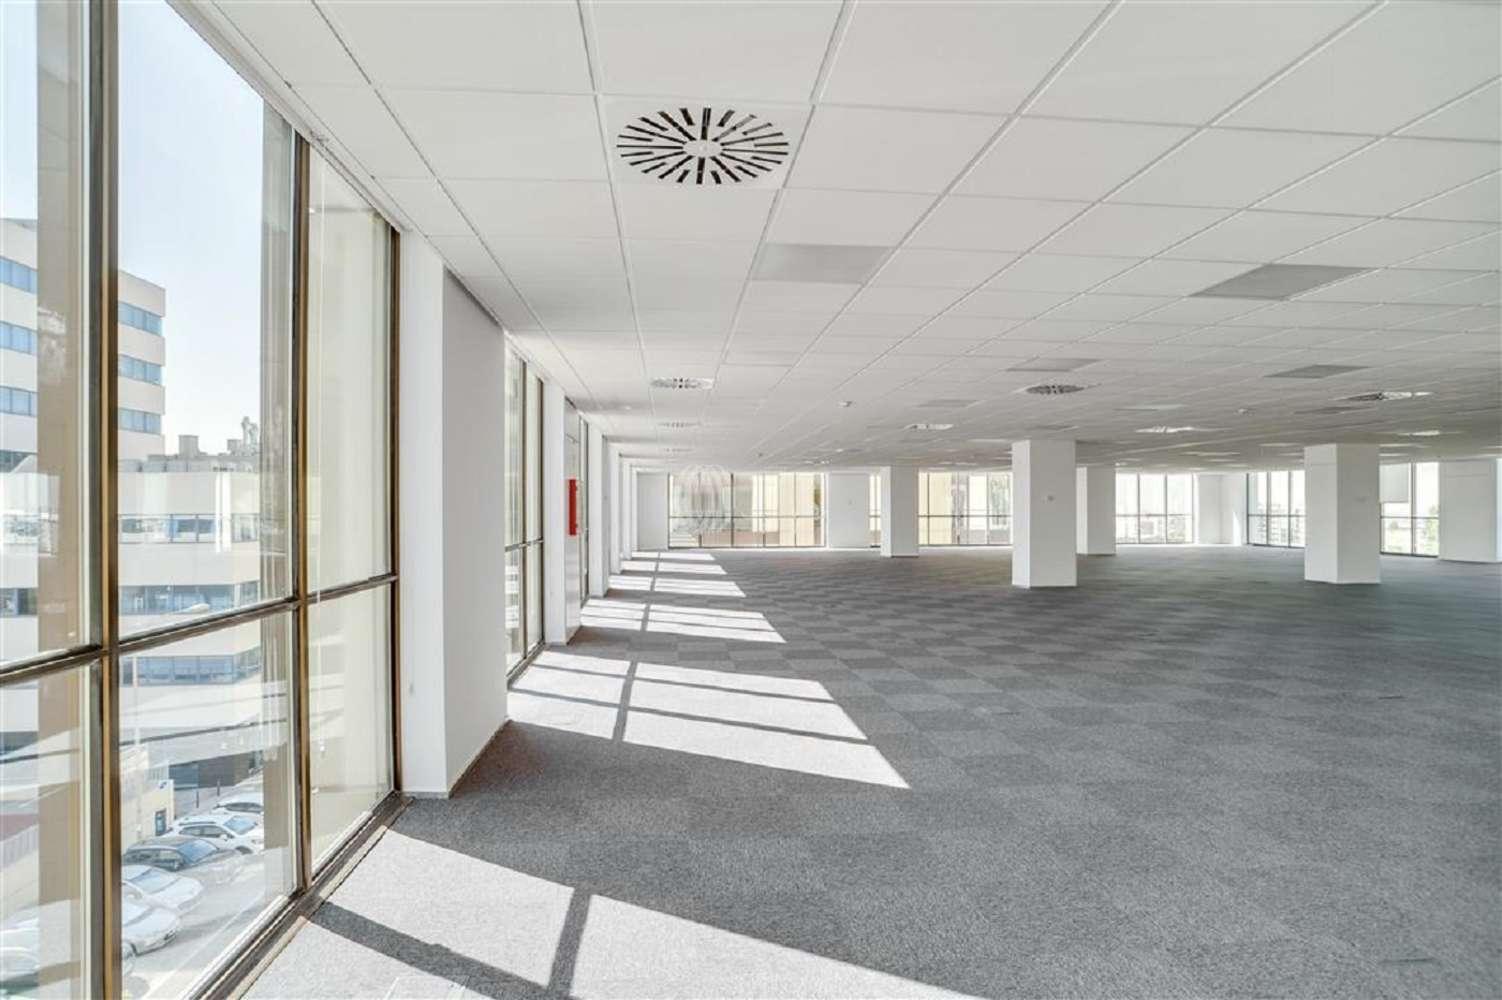 Oficina Sant just desvern, 08960 - DIAGONAL SANT JUST - Edificio A - 18593